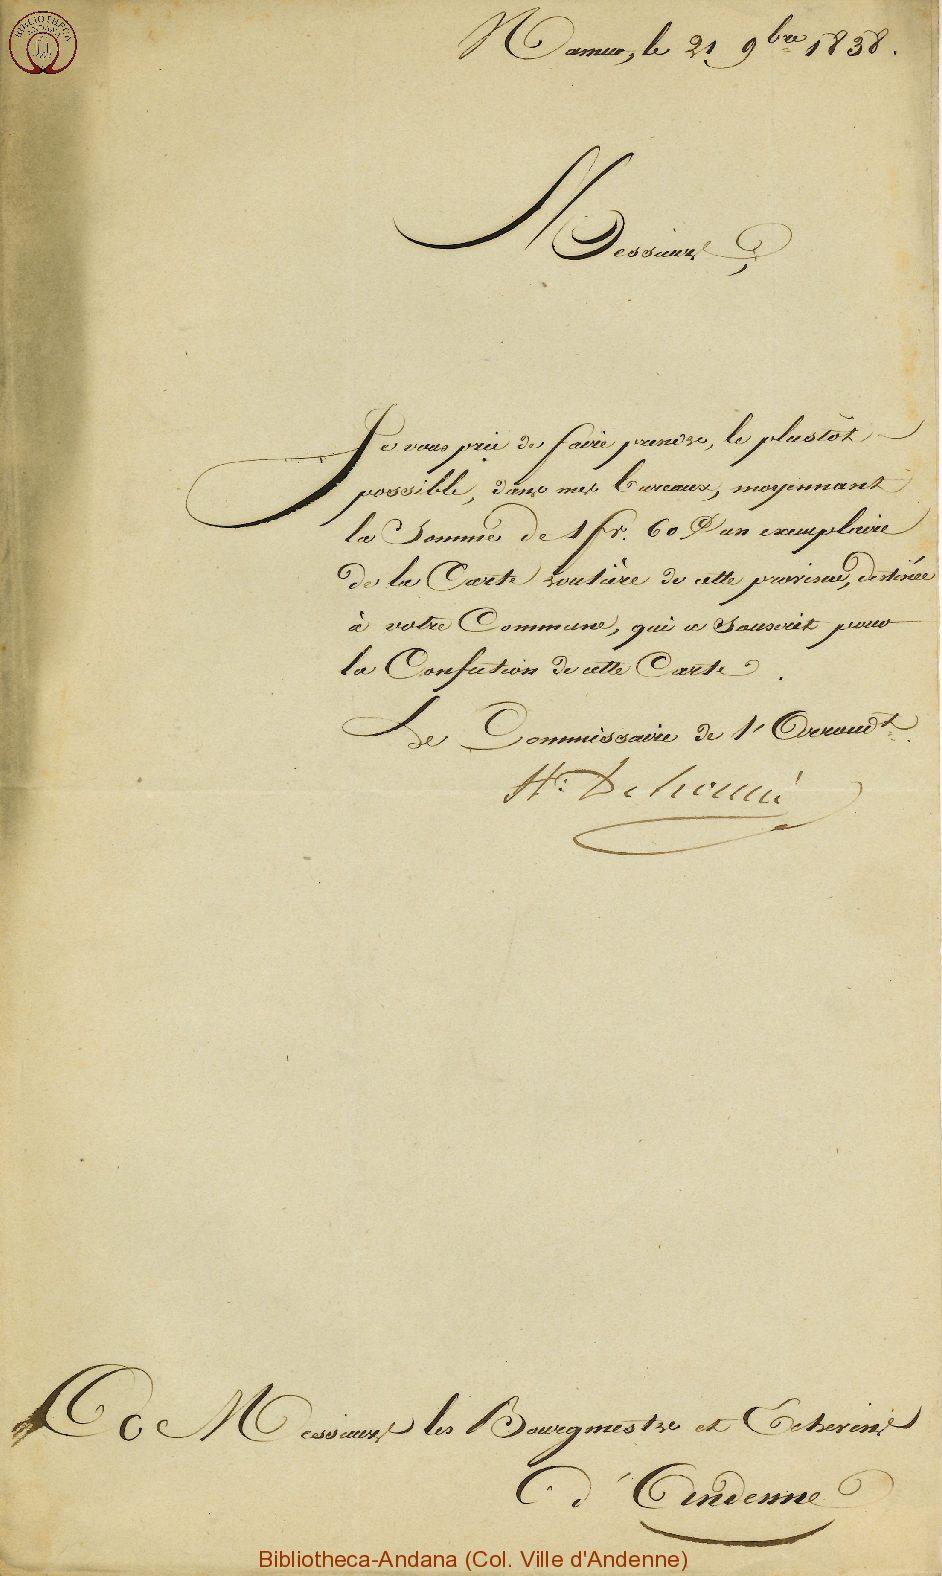 1838-11-21